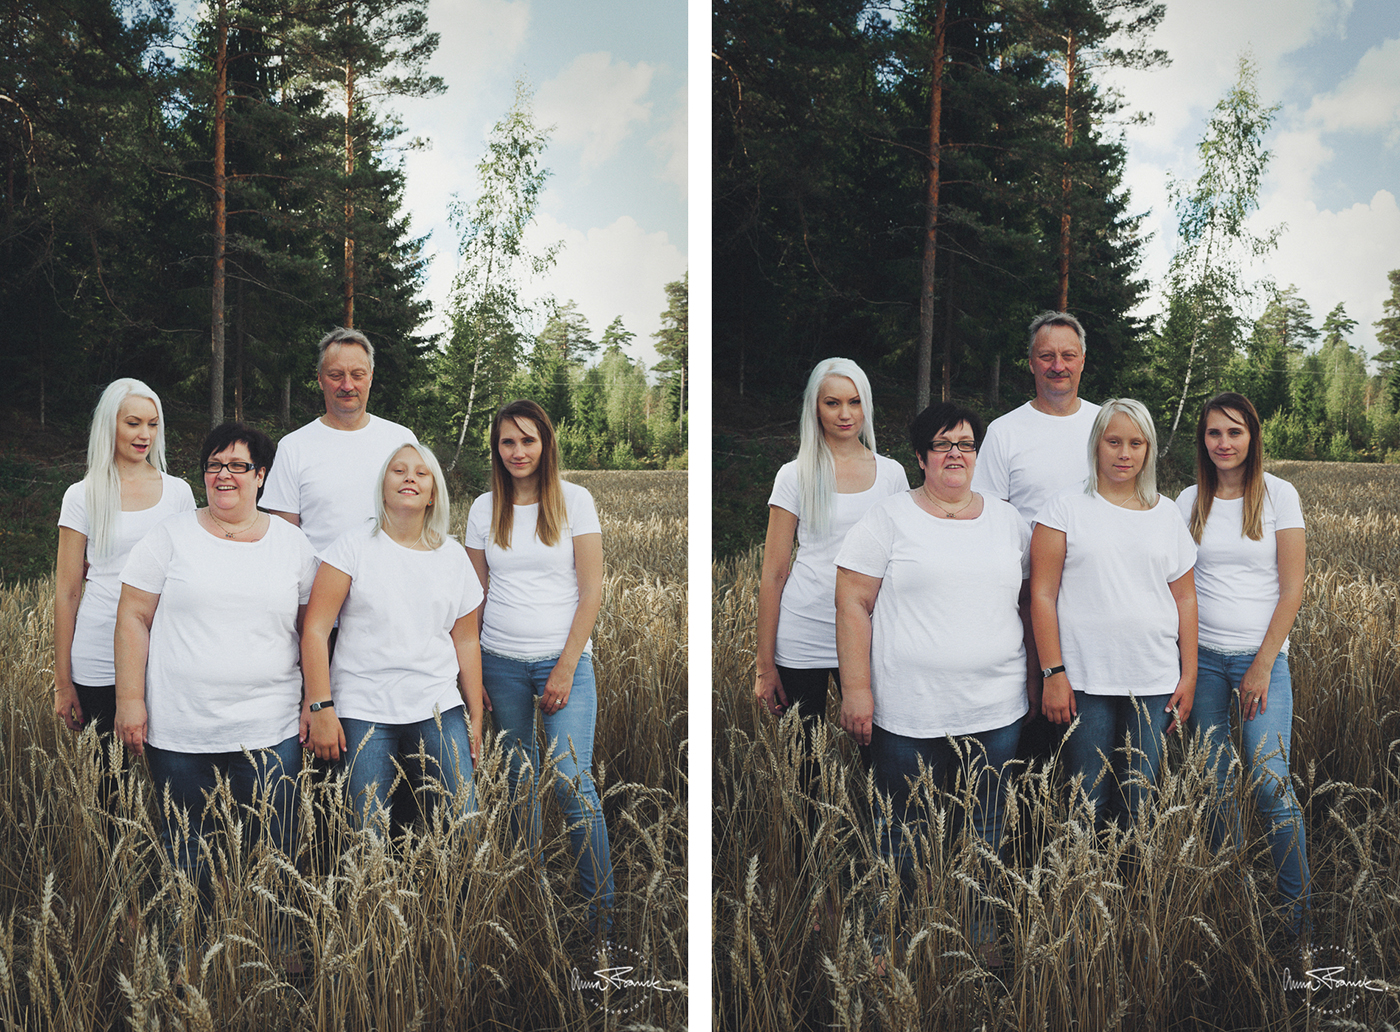 familjefoto, perhekuva, family, portrait, porträtt, muotokuva, anna, franck, pargas, parainen, finland, suomi, landet, maalla, countryside, field, åker, pelto, avslappnat, rento